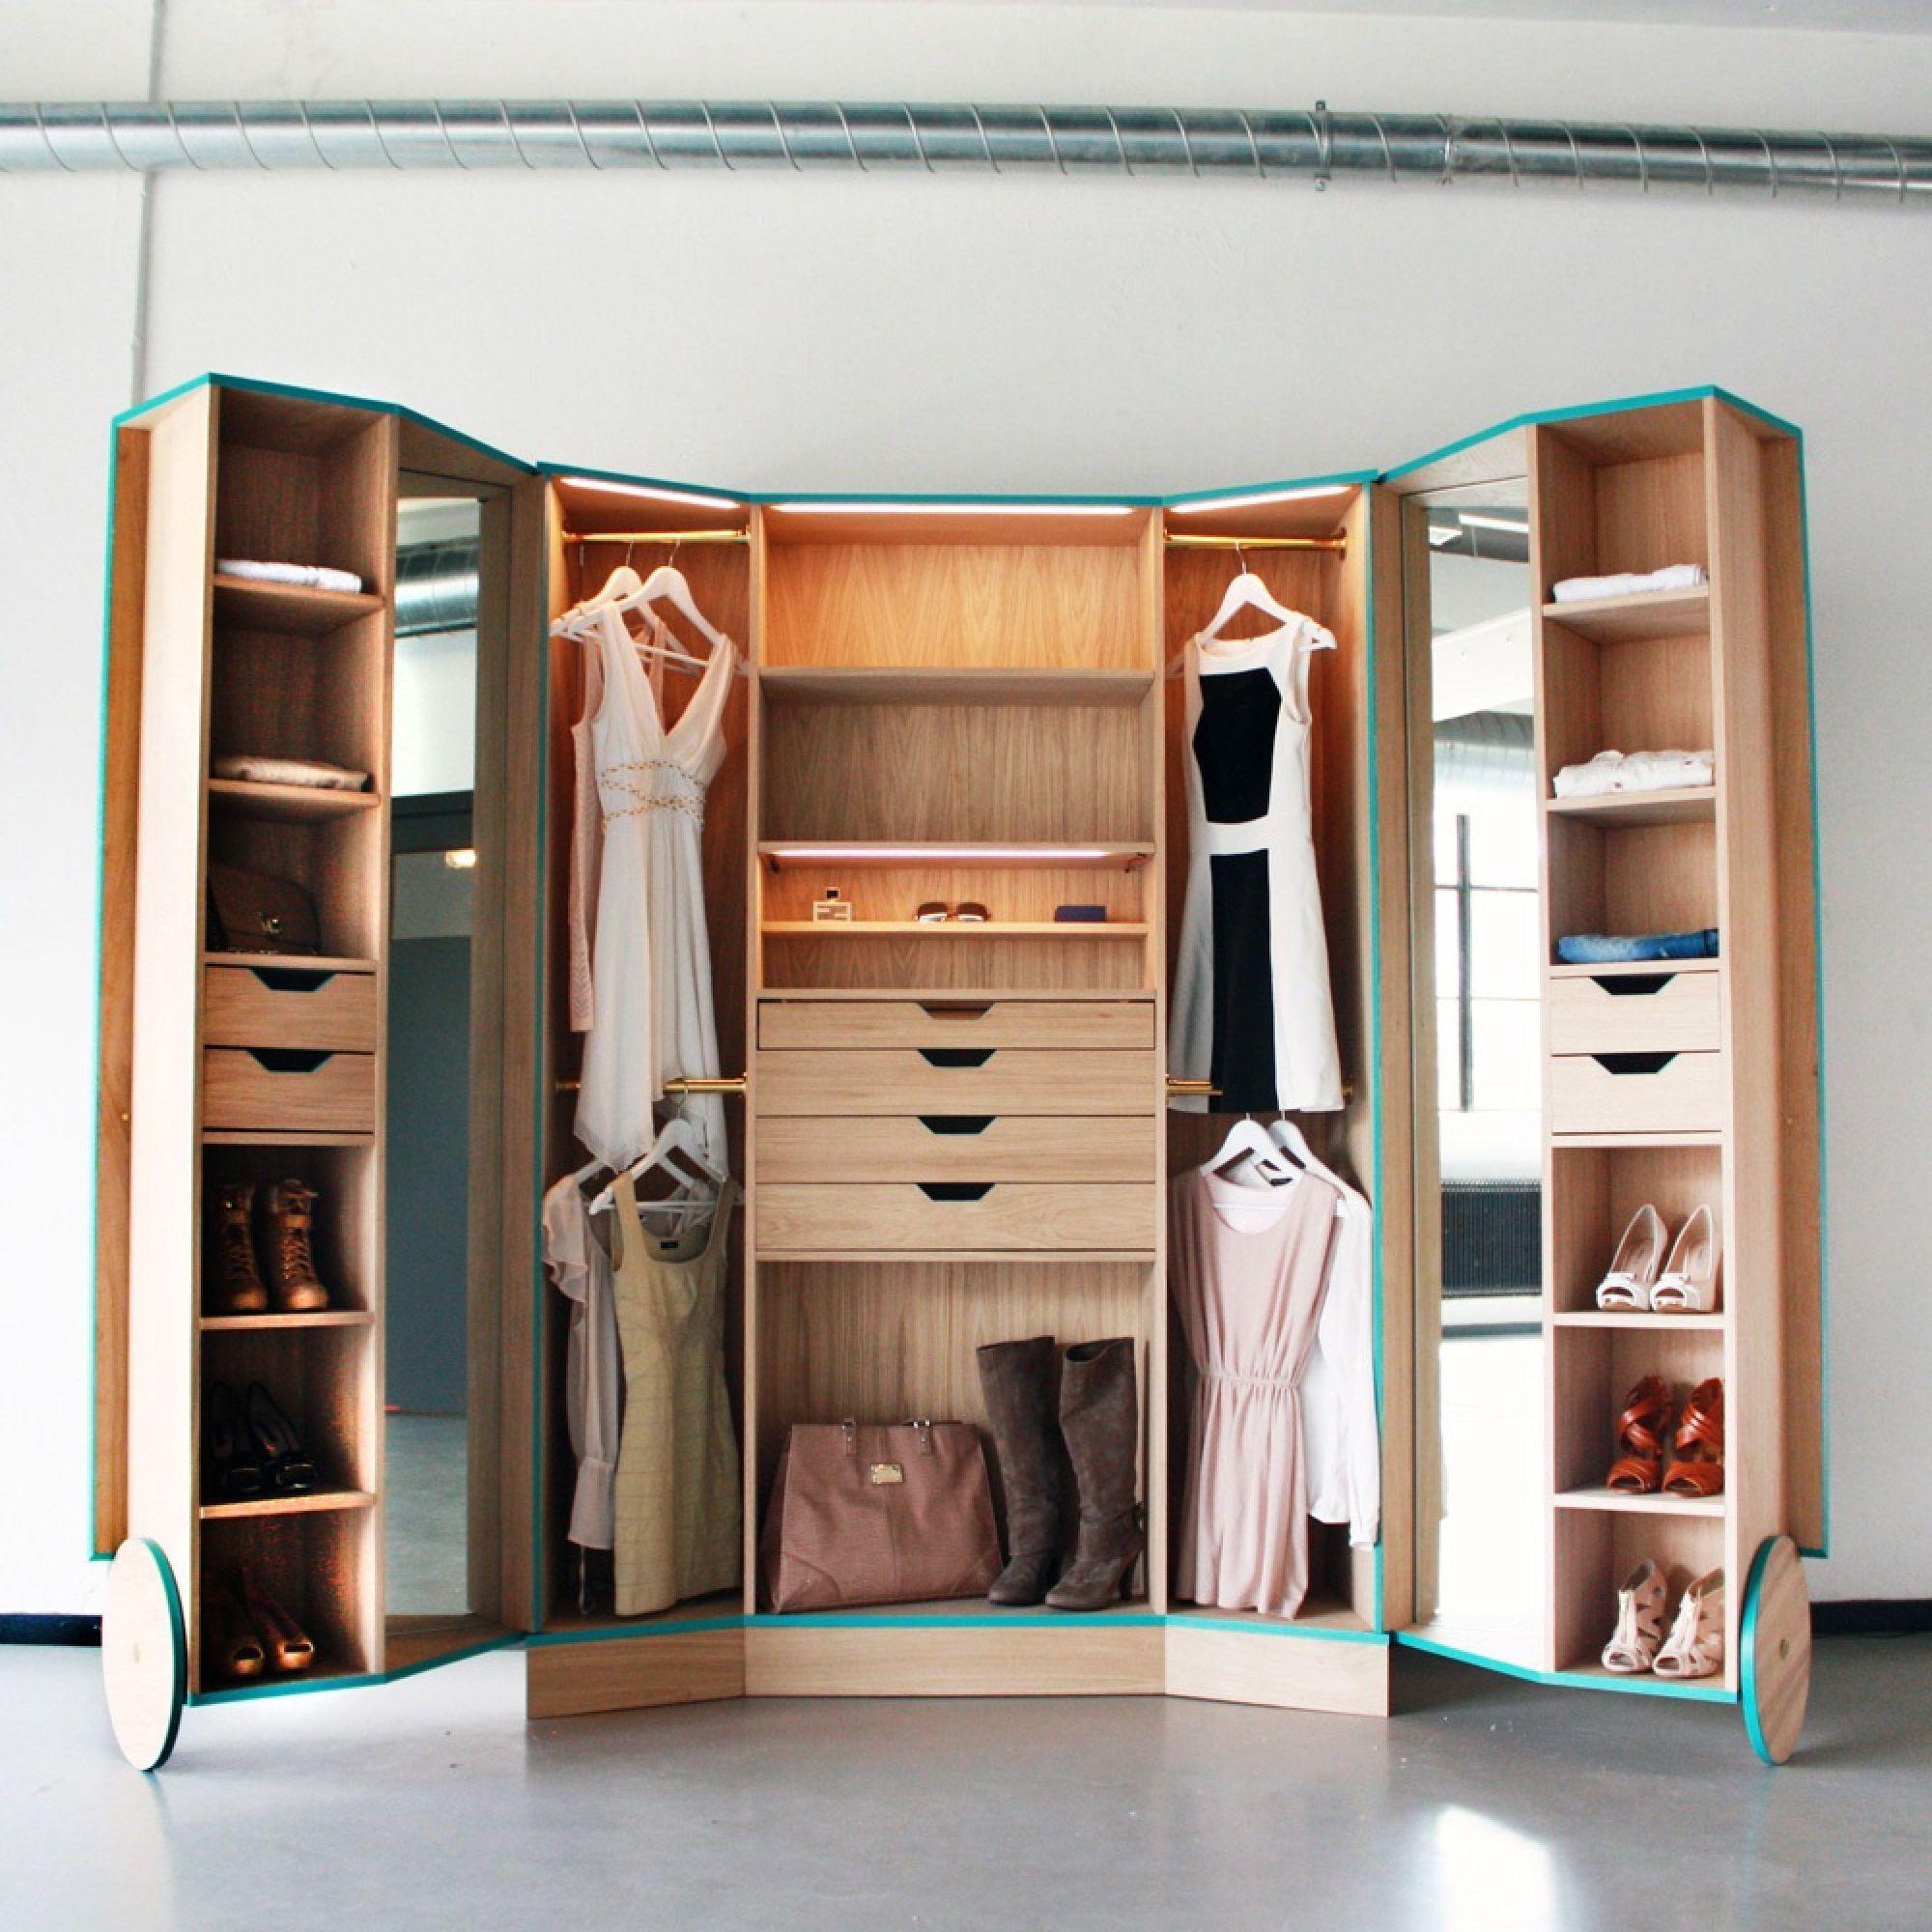 a g roselawnlutheran how to walk homey build in diy organization closet pinterest wardrobe